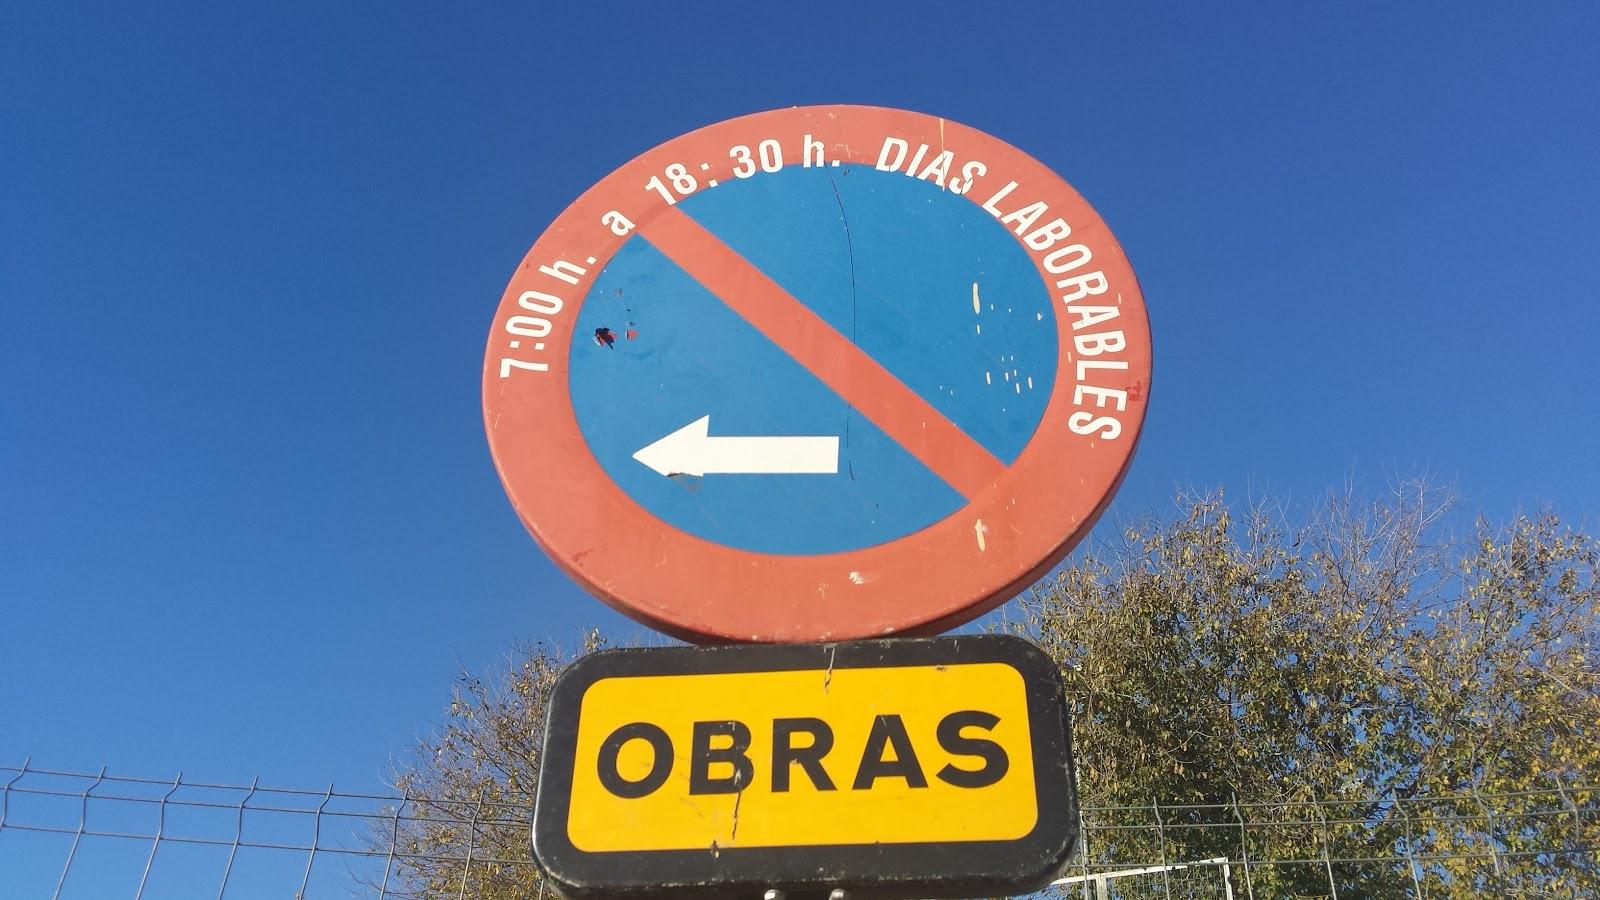 Obras Plan Supera 3 en Alcalá de Guadaíra